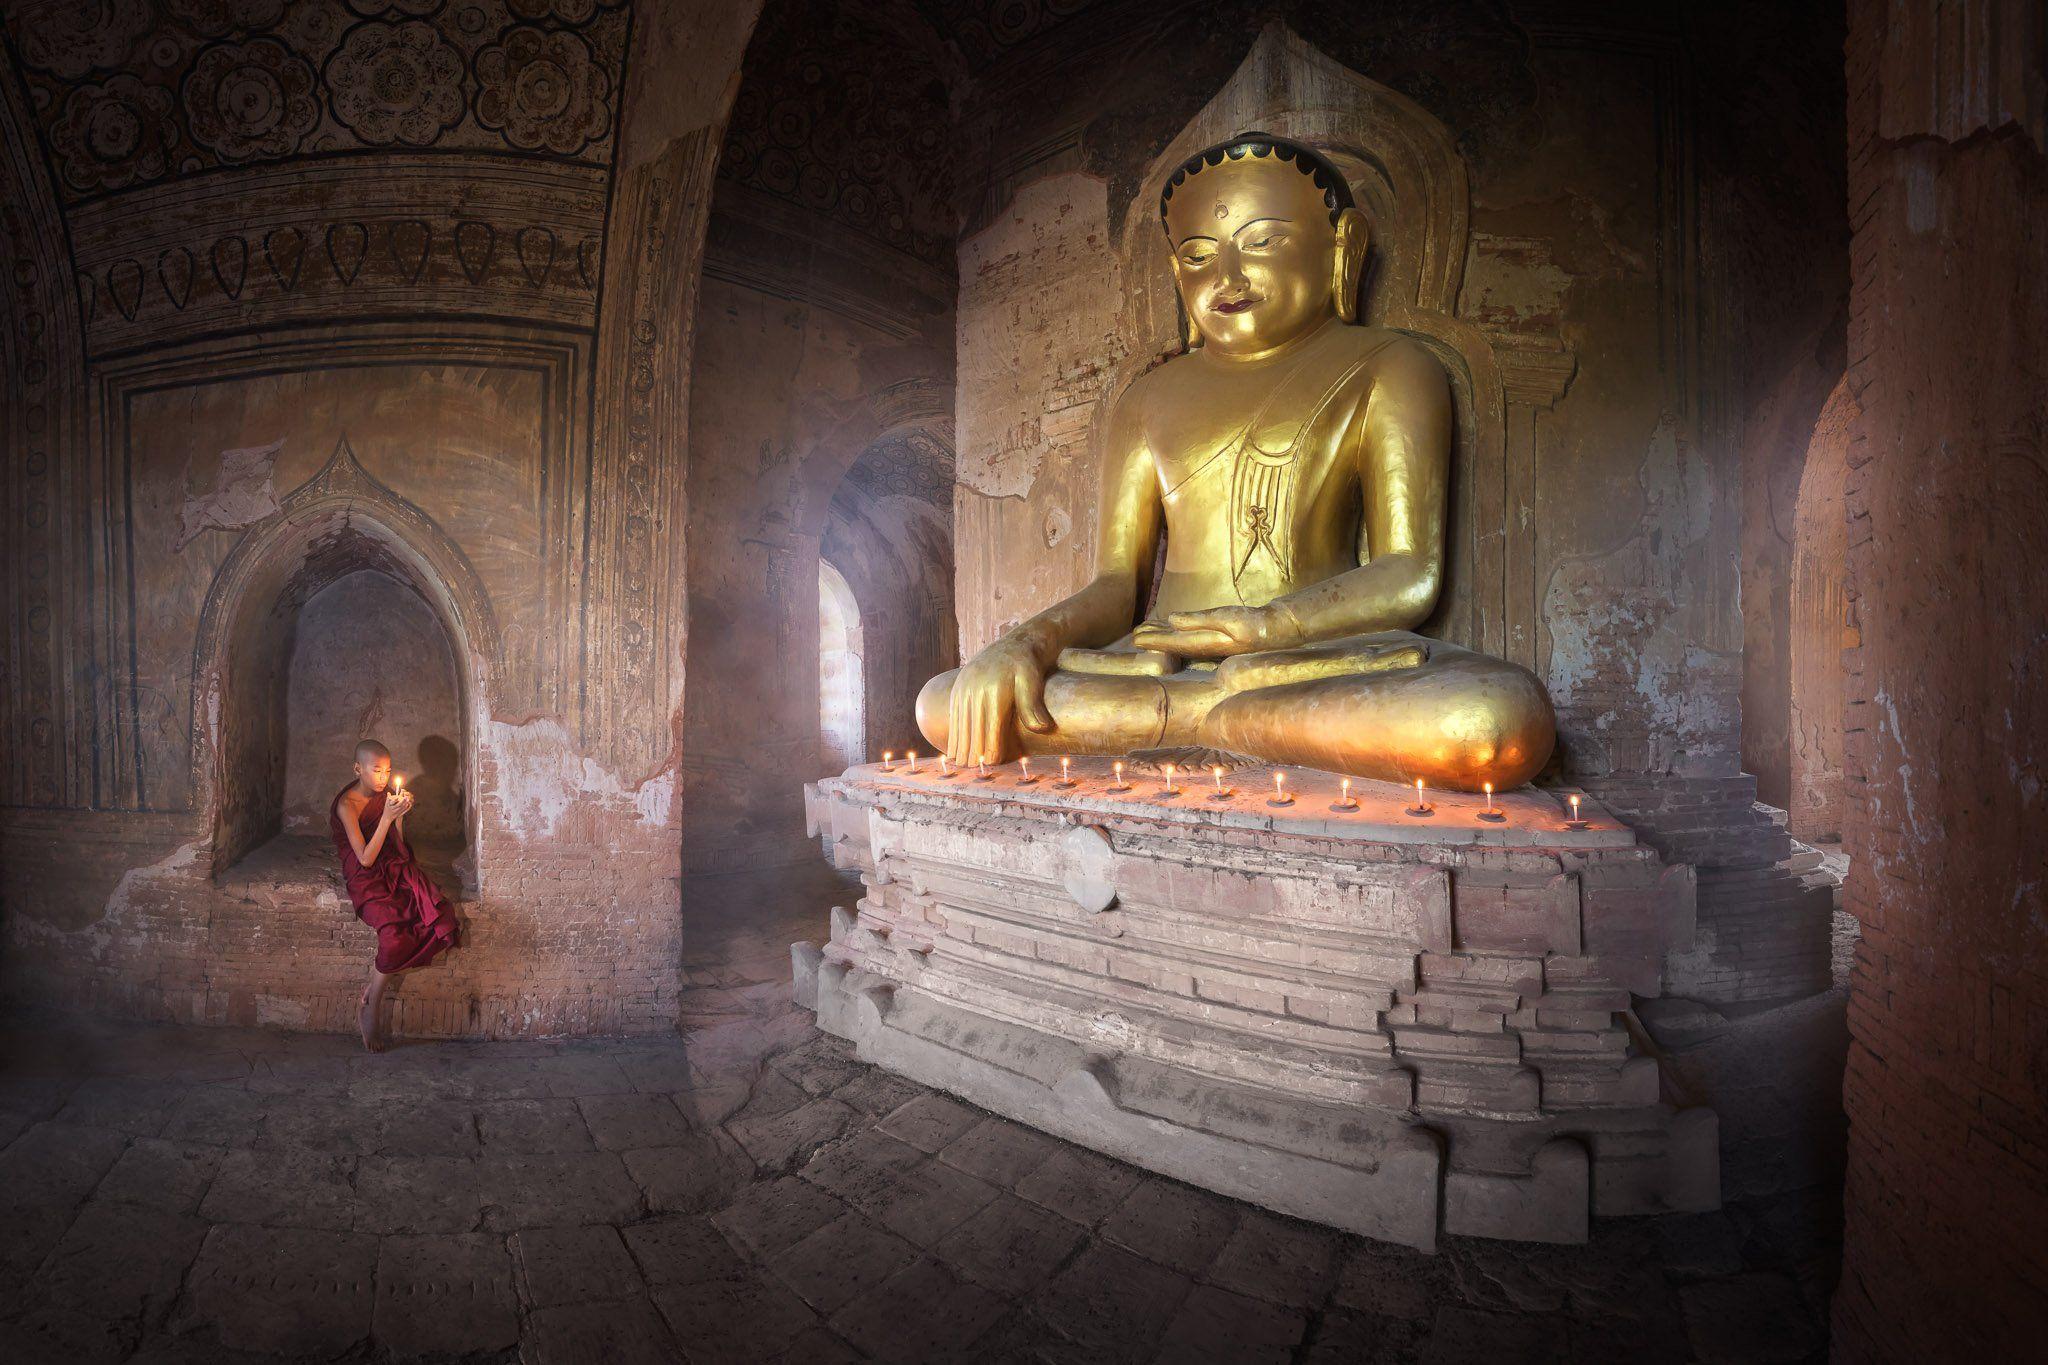 ancient, archeological, architecture, asia, asian, bagan, belief, buddha, buddhism, buddhist, burma, burmese, candle, children, culture, destination, faith, gold, golden, inside, interior, kid, landmark, light, little, man, meditation, monastery, monk, my, Omelyanchuk Andrey